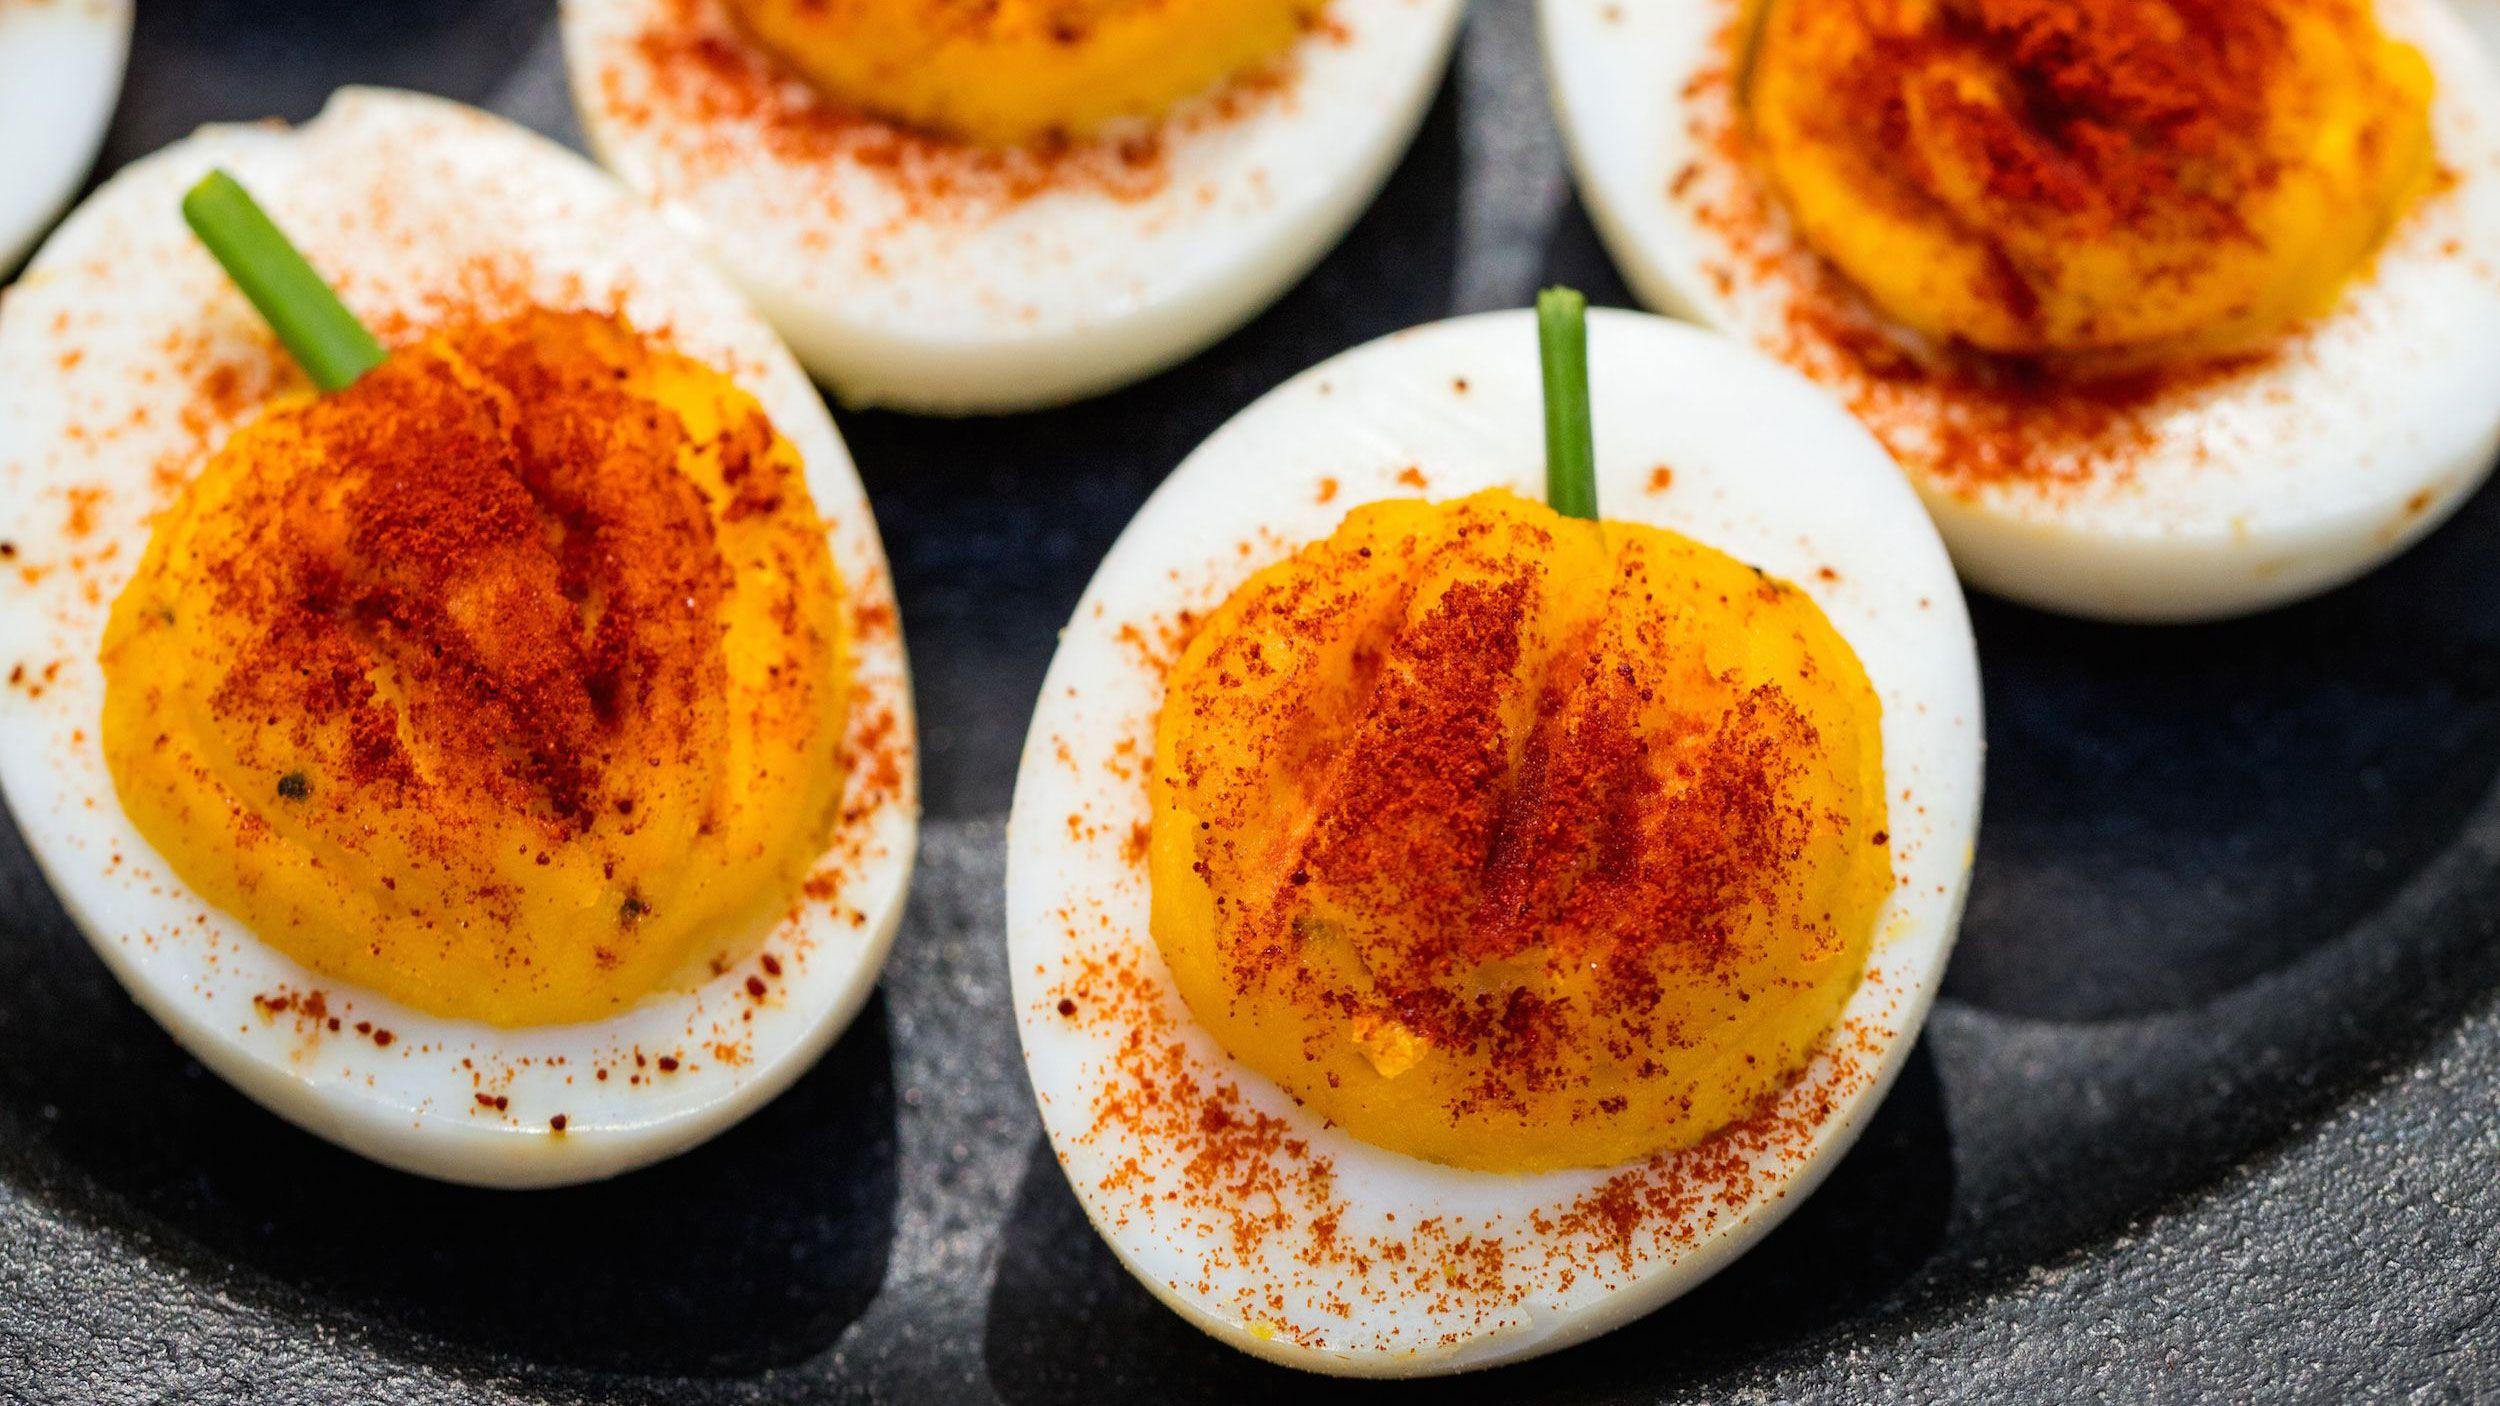 How to Make Pumpkin Deviled Eggs